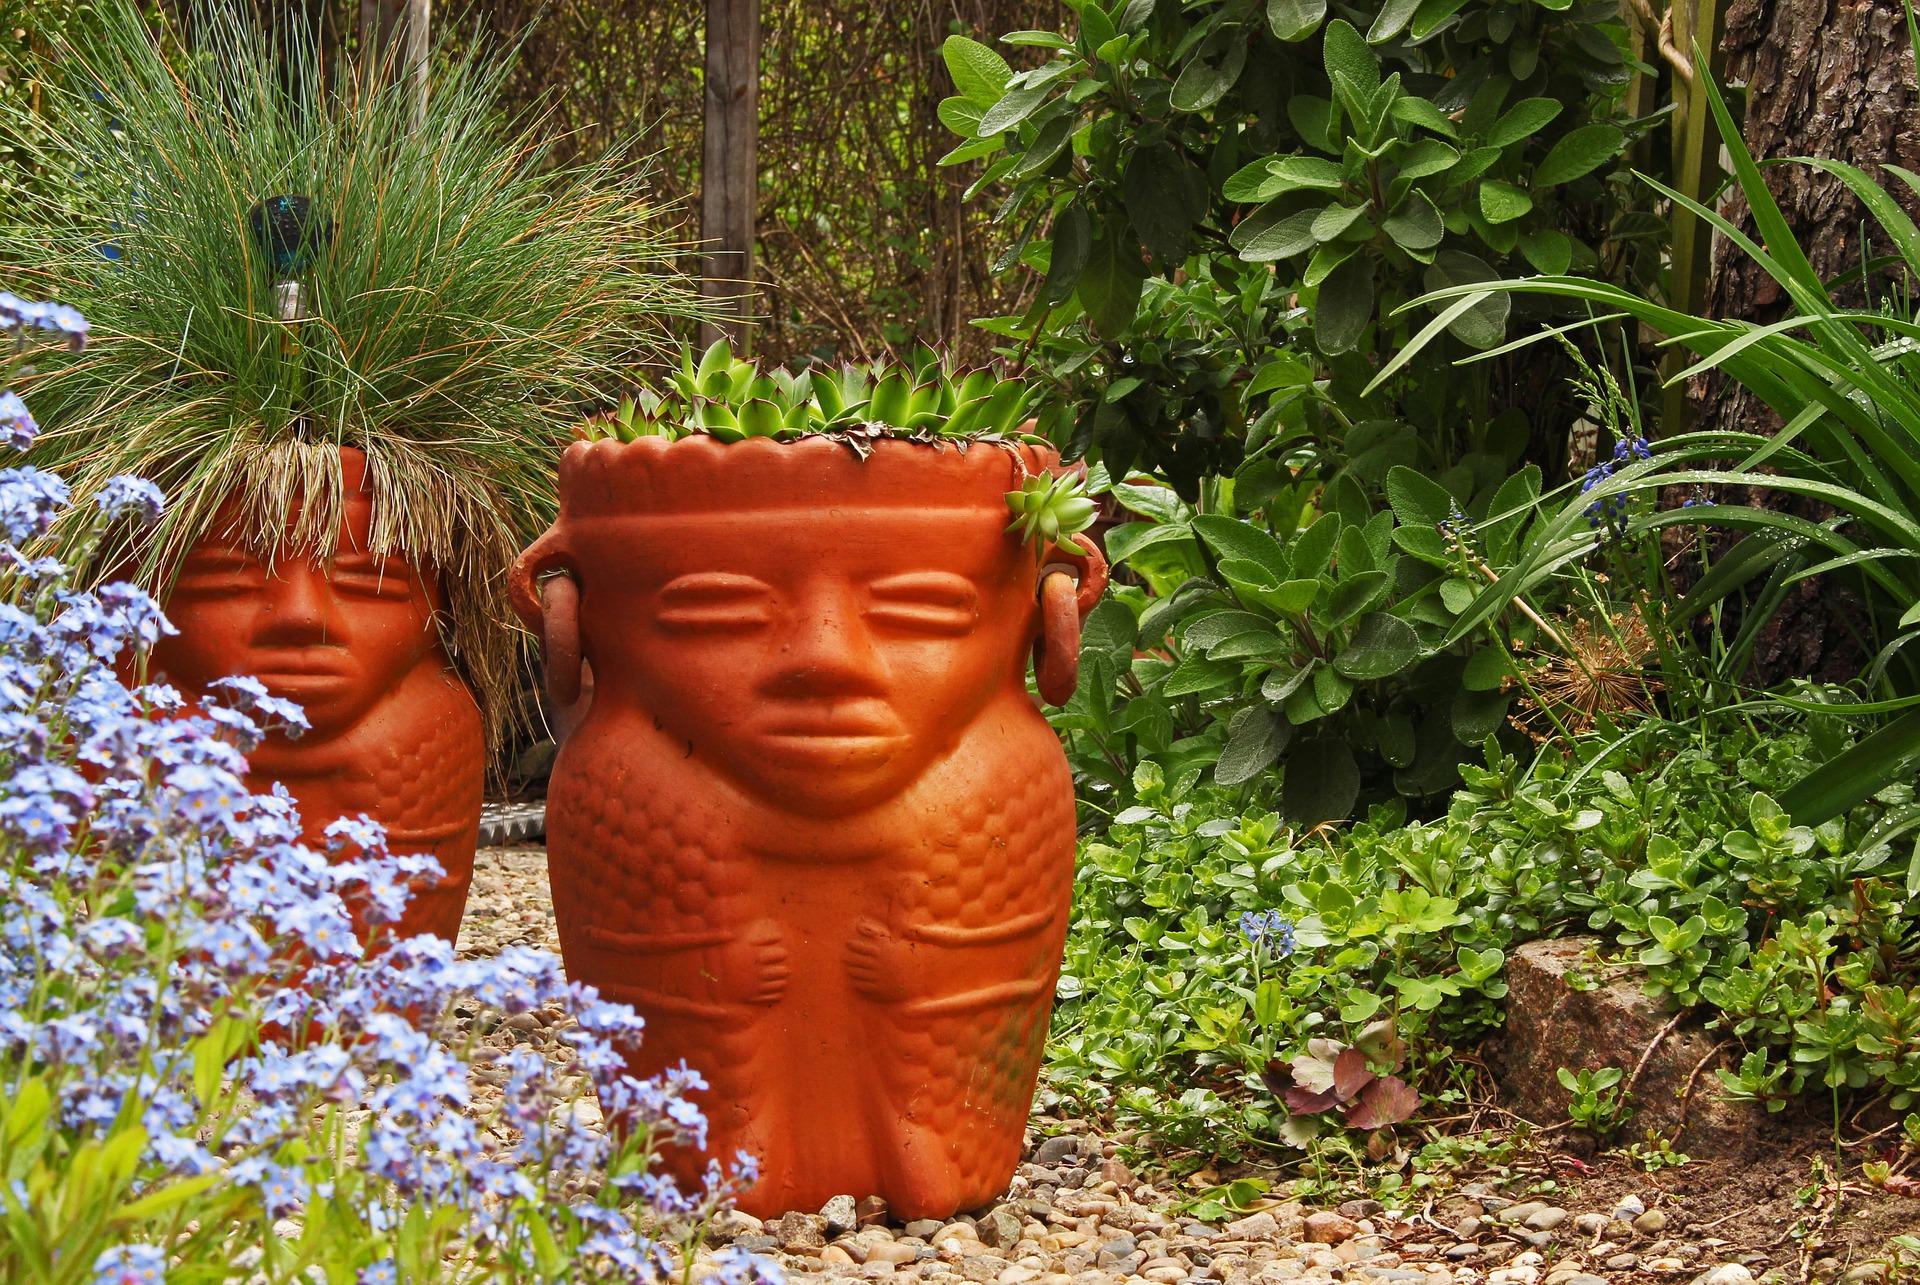 garden ornaments ornamental design focal point